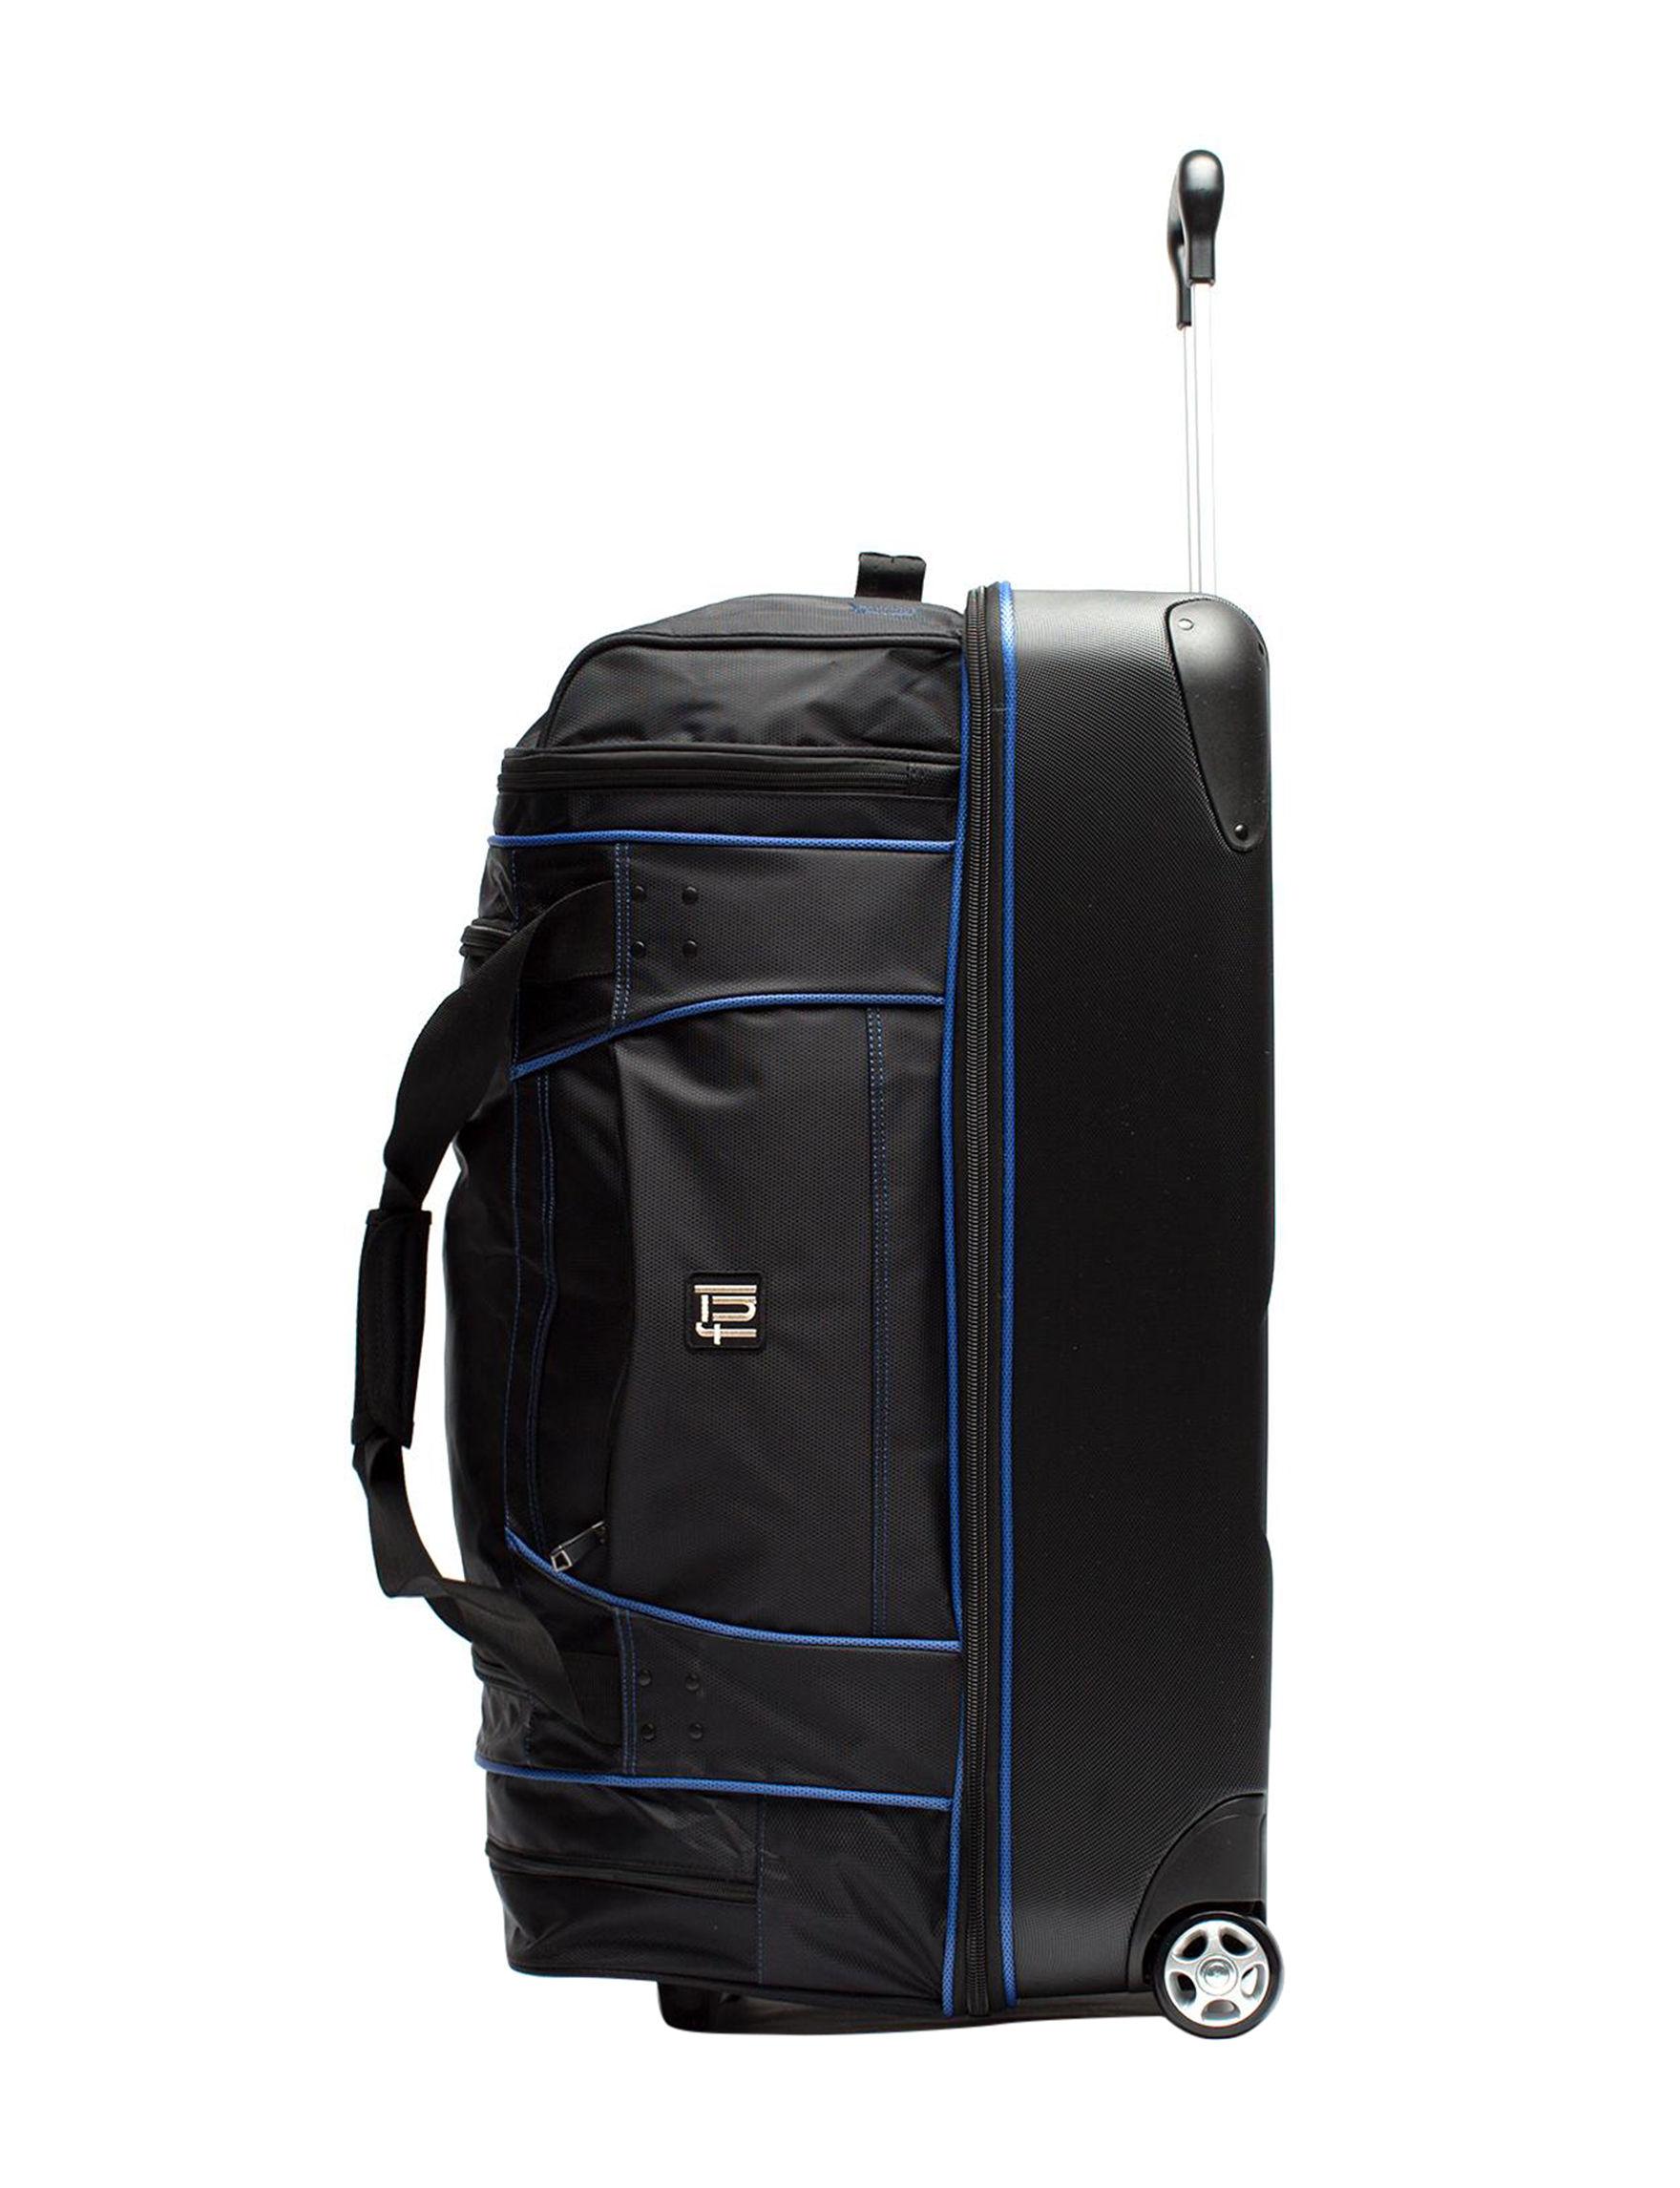 Ful Black / Blue Duffle Bags